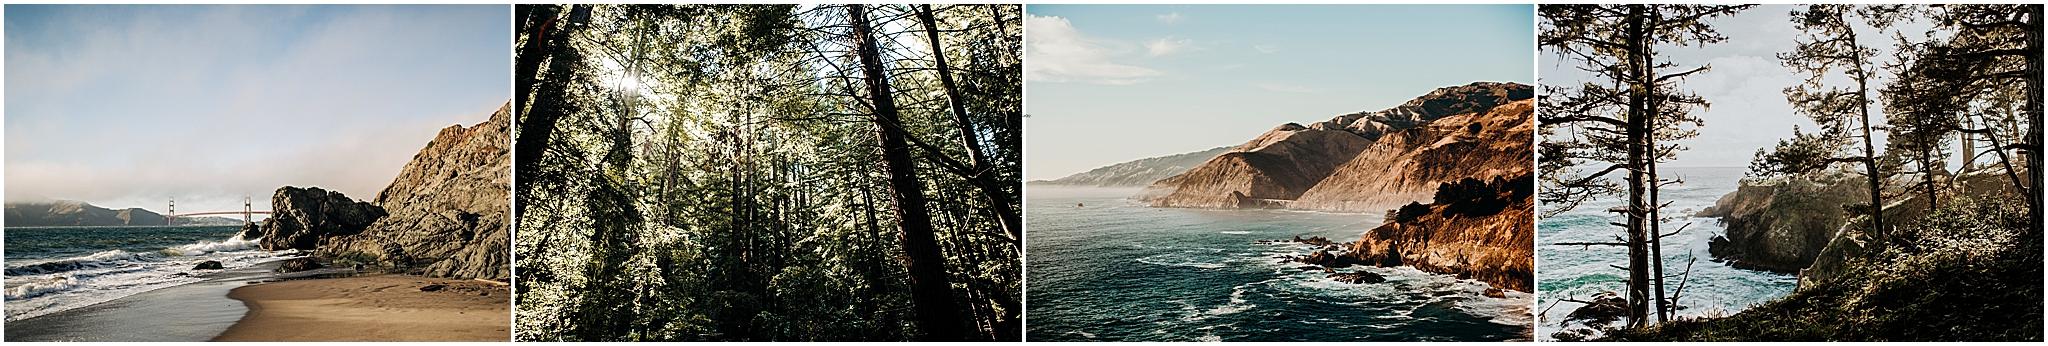 elope in san francisco, elope in the redwoods, elope in big sur, elope in fort bragg, elope in mendocino